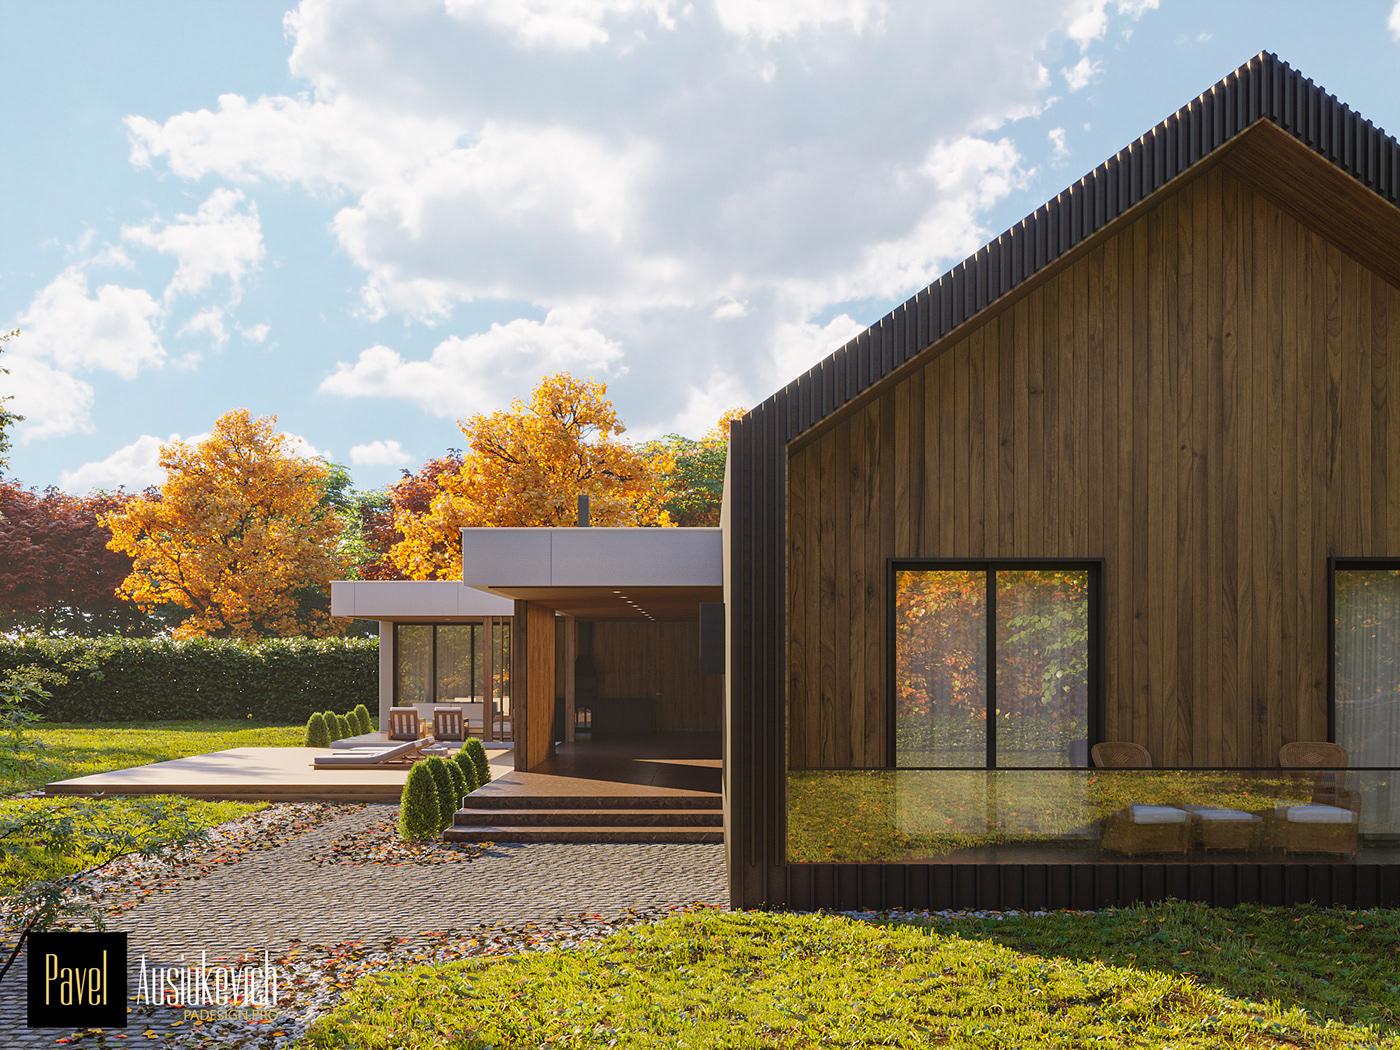 architecrure design Project cg artist exterior Landscape Design Residential house HOUSE DESIGN